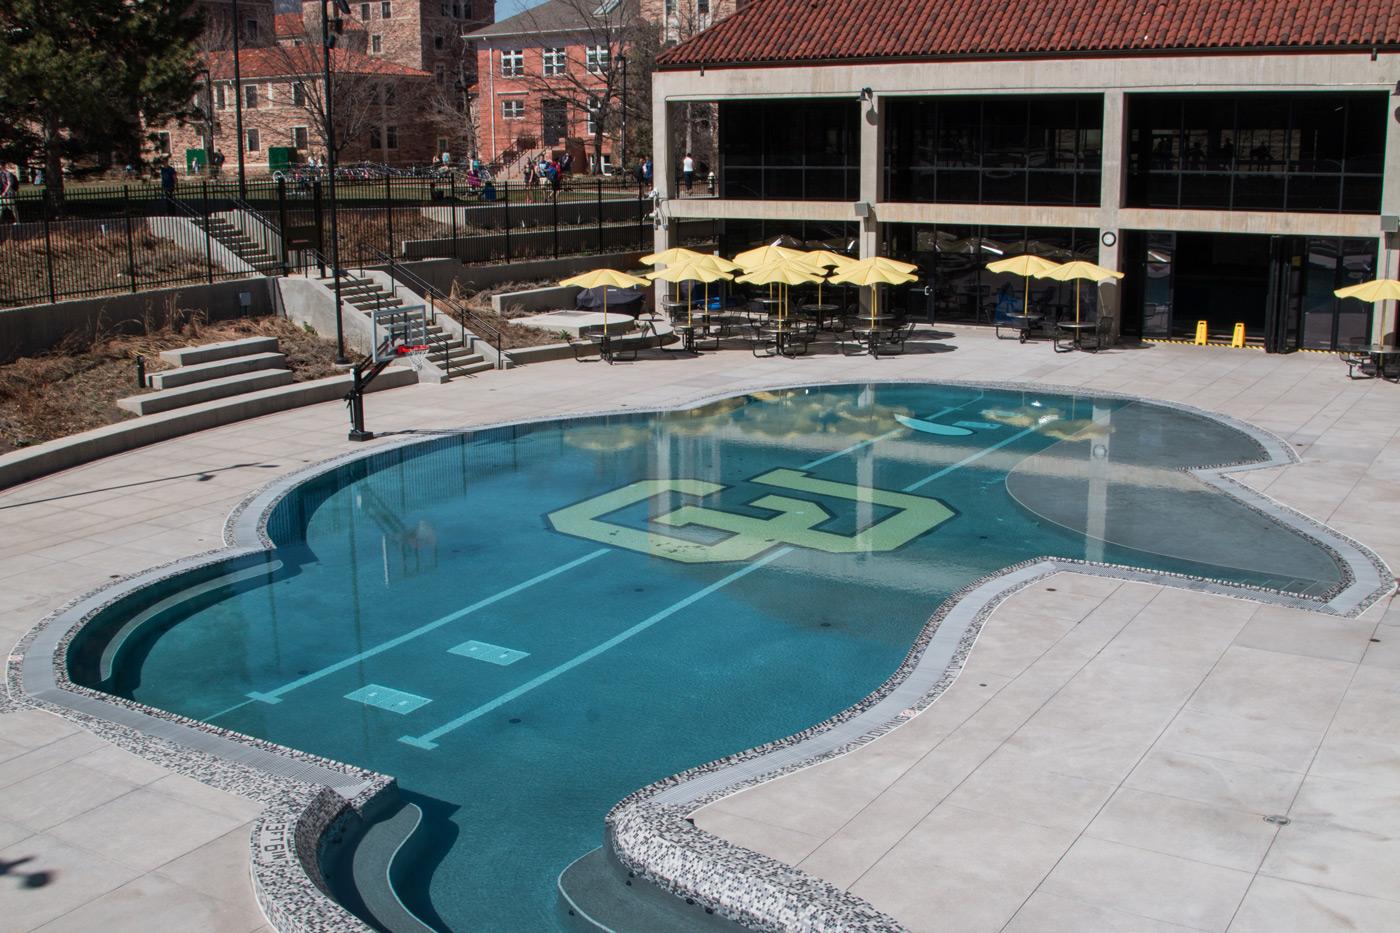 University of Colorado campus grounds